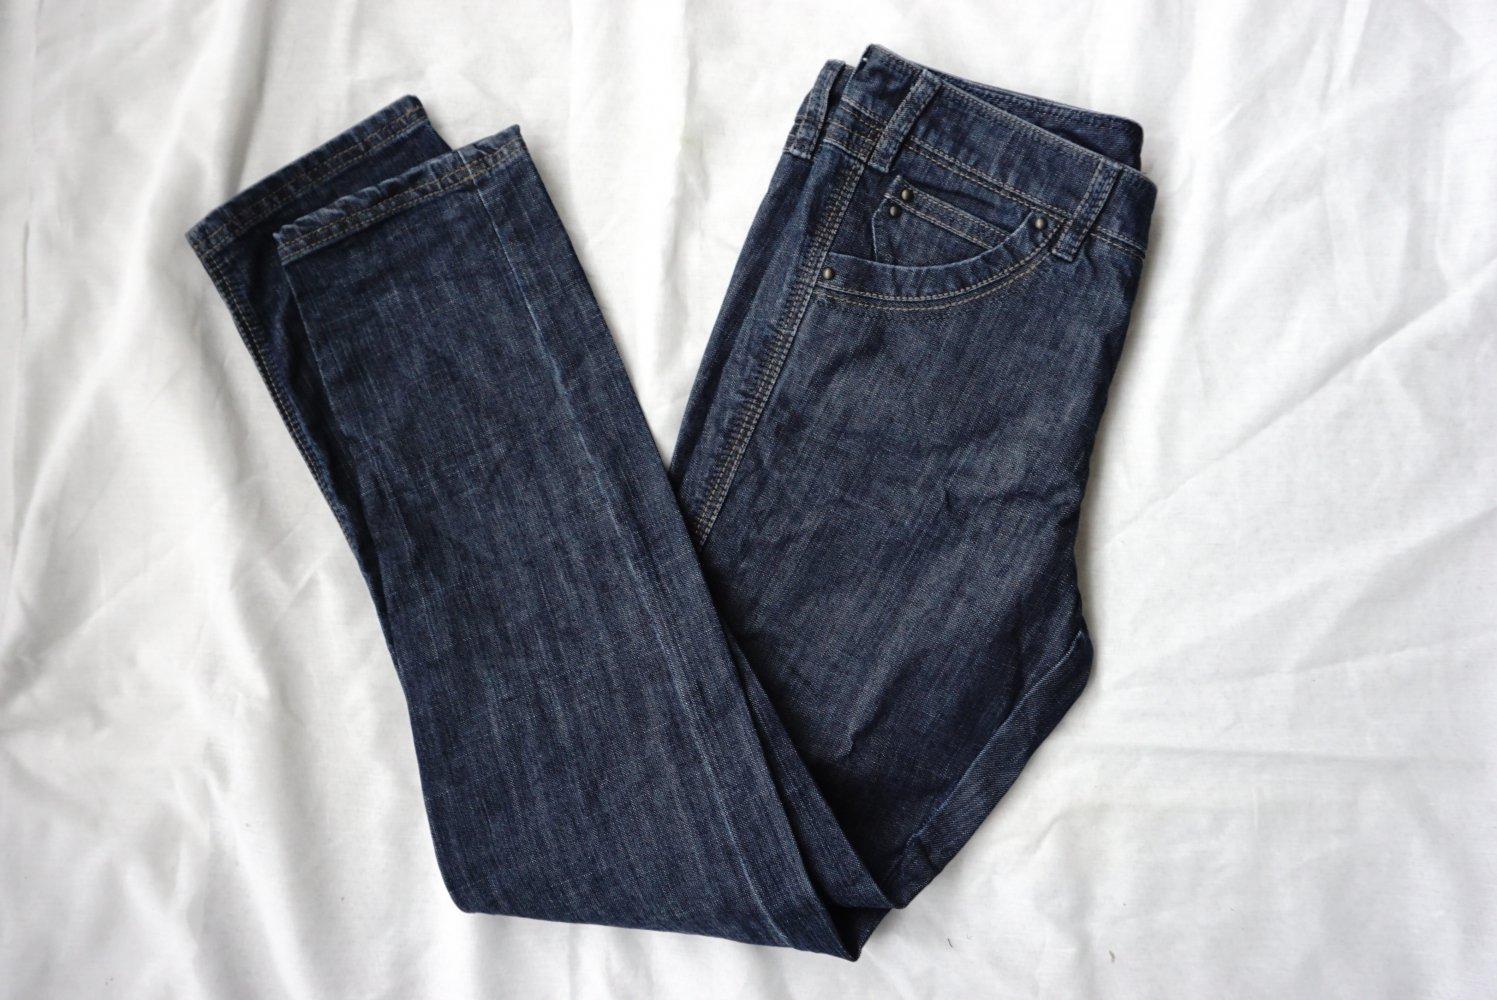 Herrlicher Damen Straight Leg Jeanshose Pitch Denim Stretch, Gr. W30L32, Blau (medium 0550)